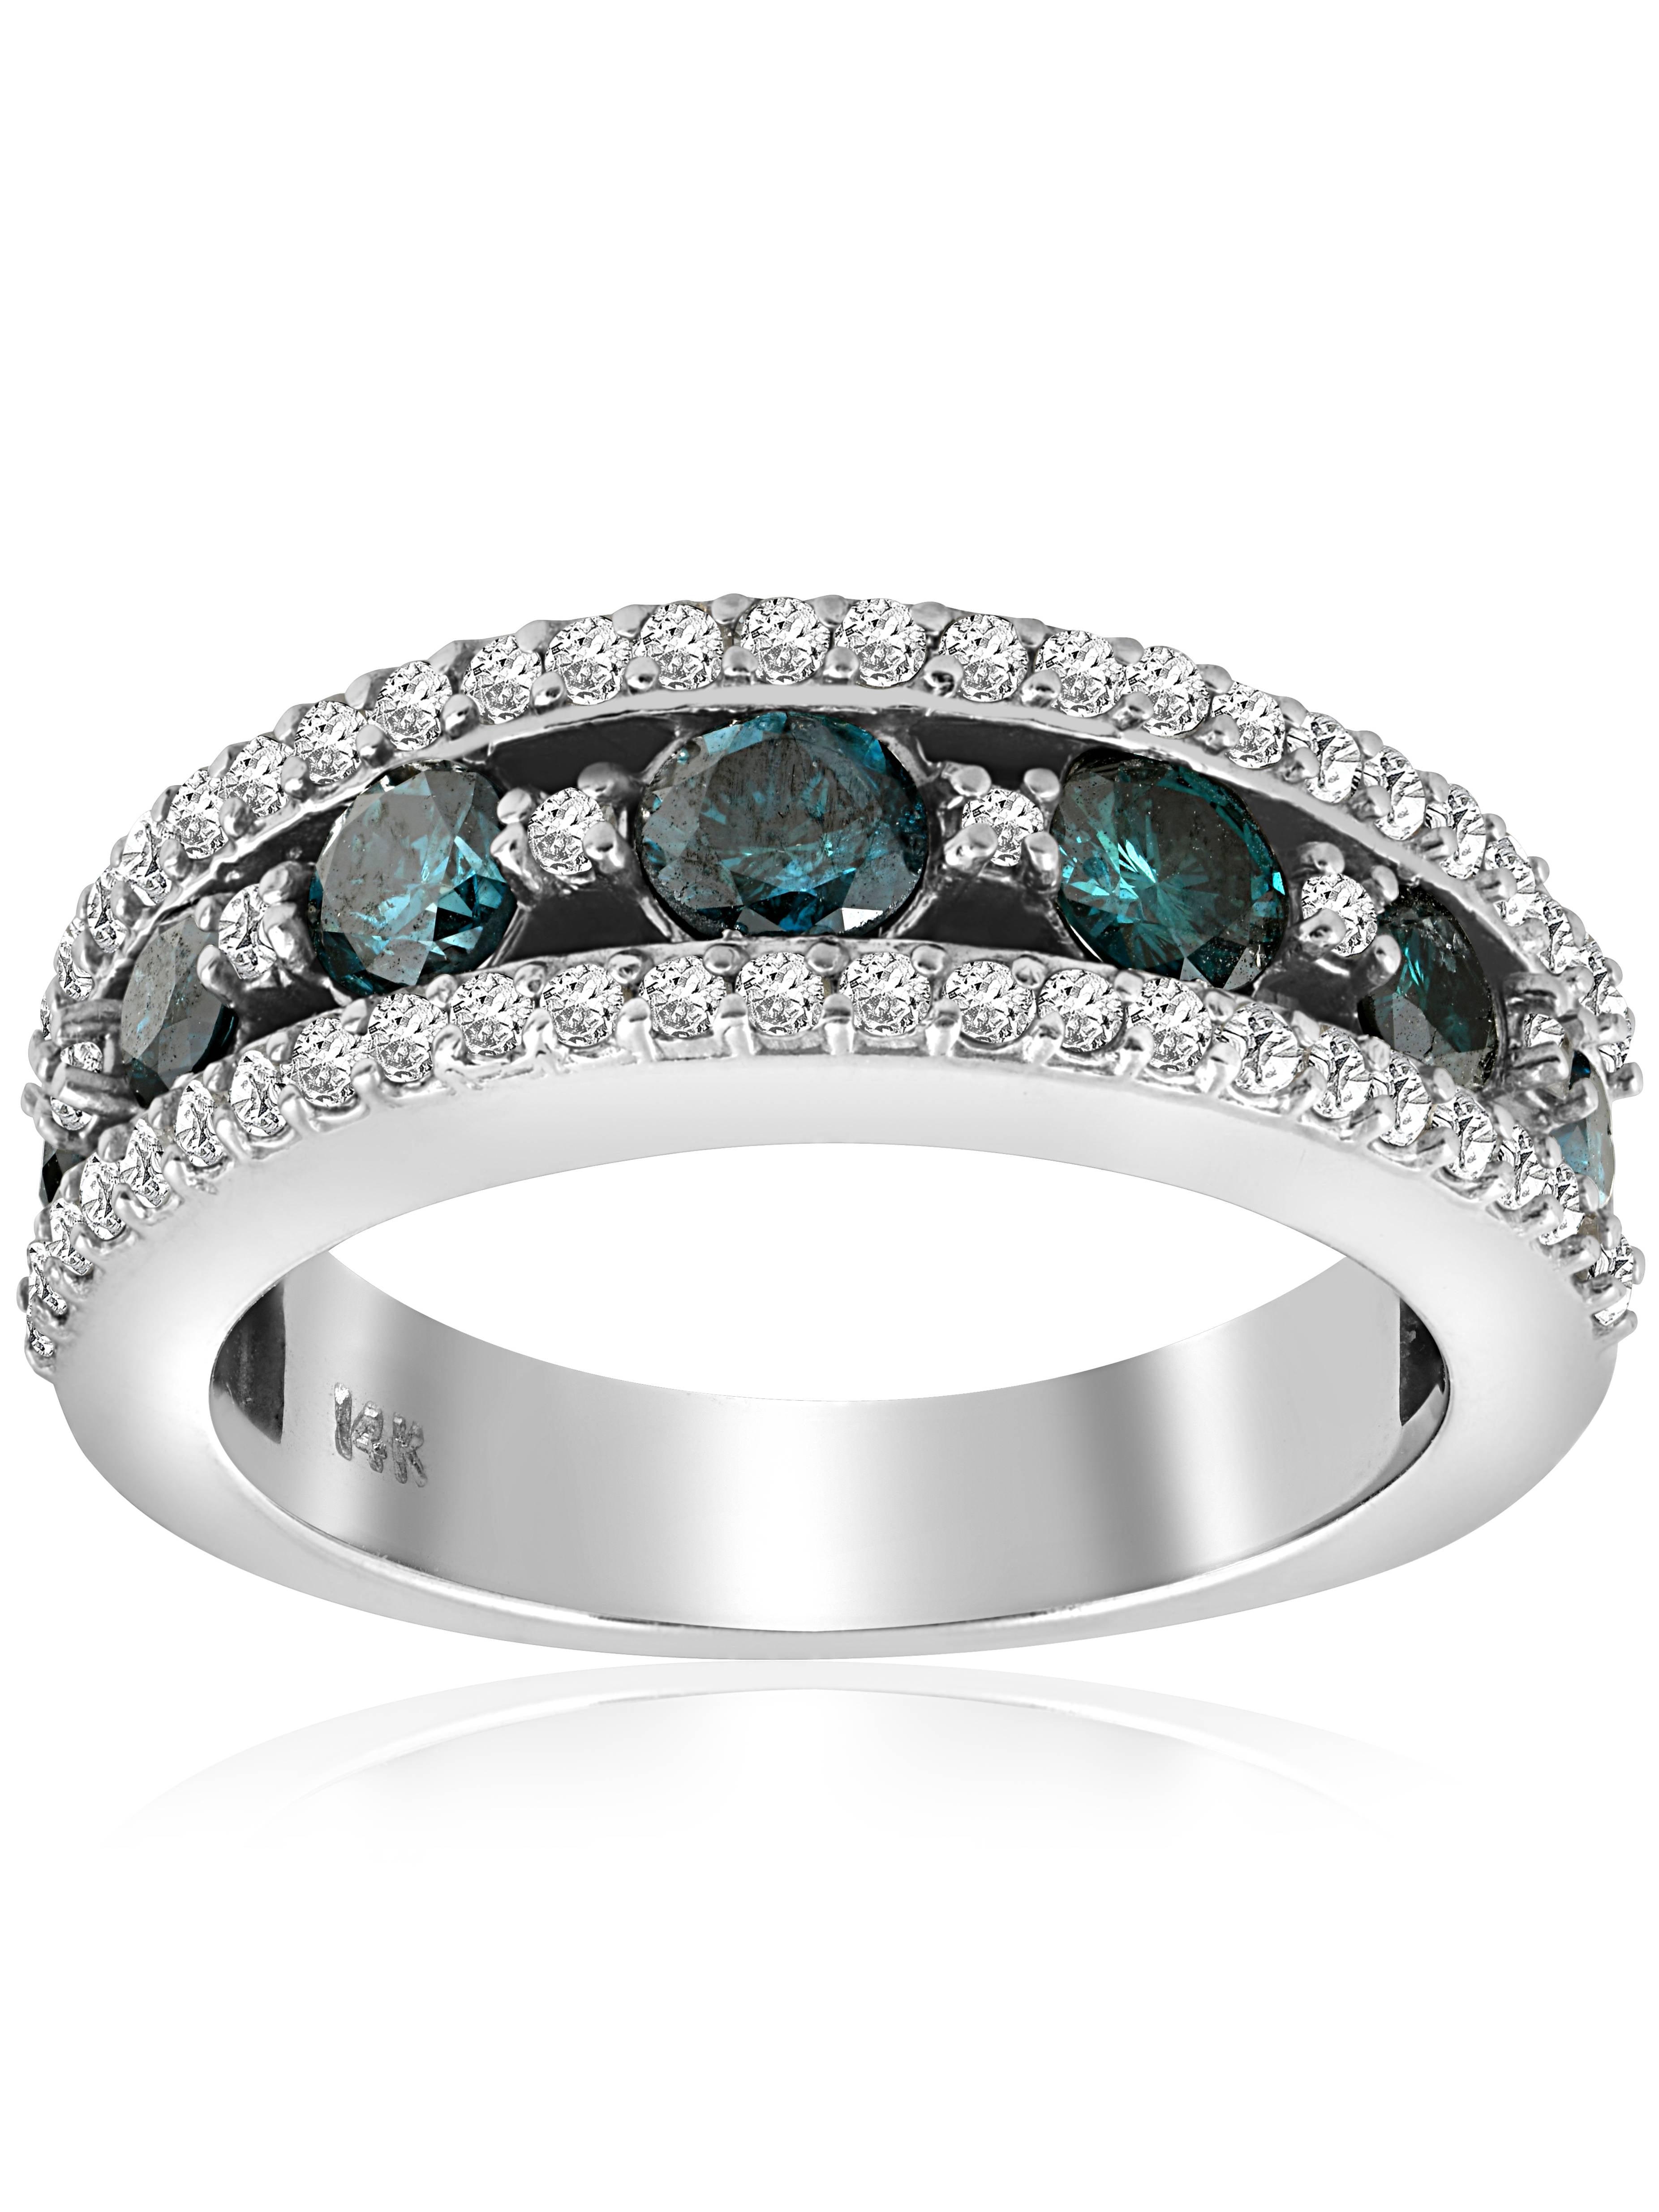 1 3 4ct Treated Blue Diamond & White Wide Wedding Ring 14K White Gold by Pompeii3